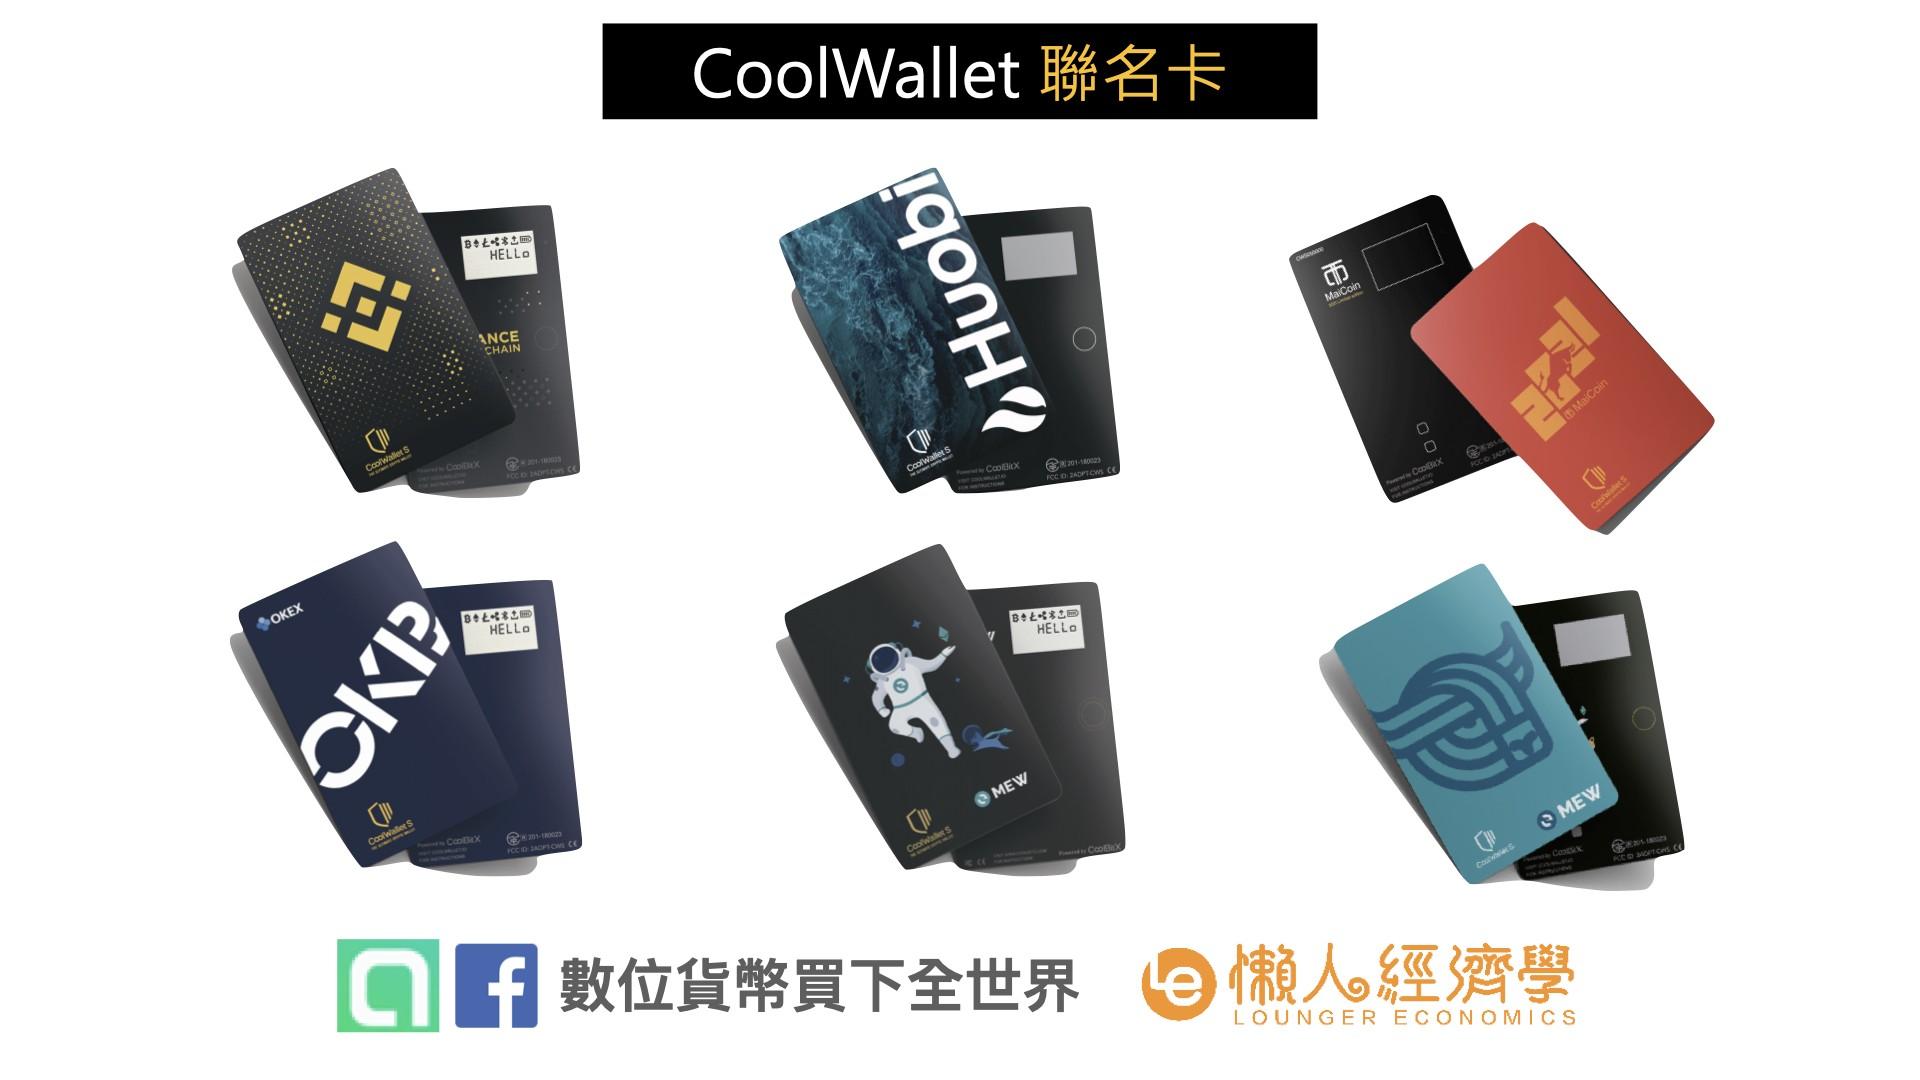 CoolWallet 錢包比較:聯名卡